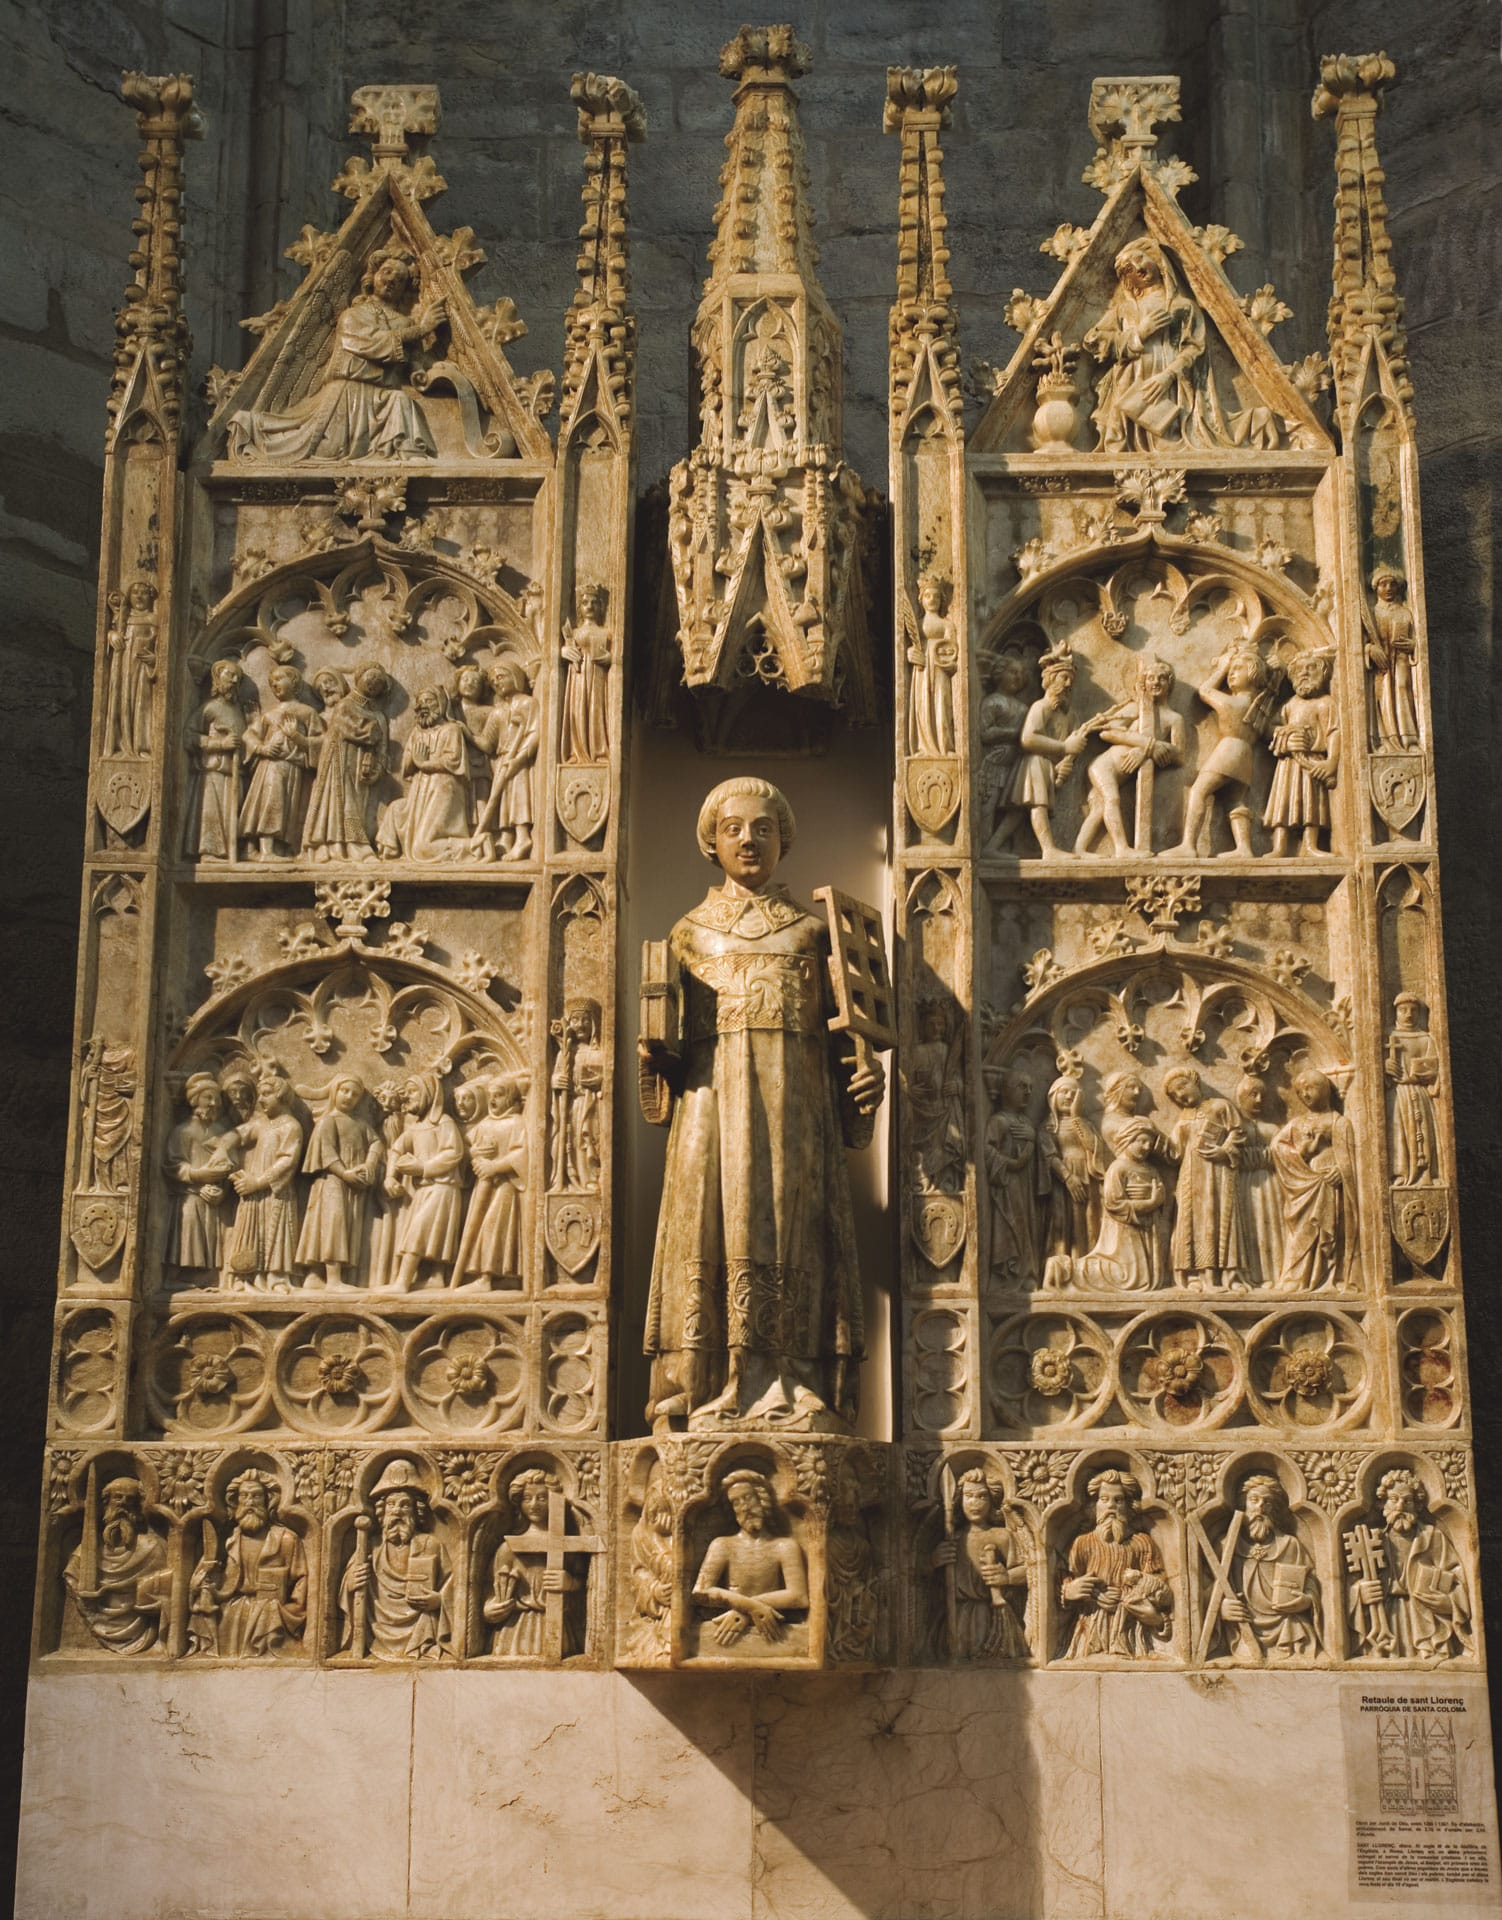 Retaule de Sant Llorenç de Santa Coloma de Queralt